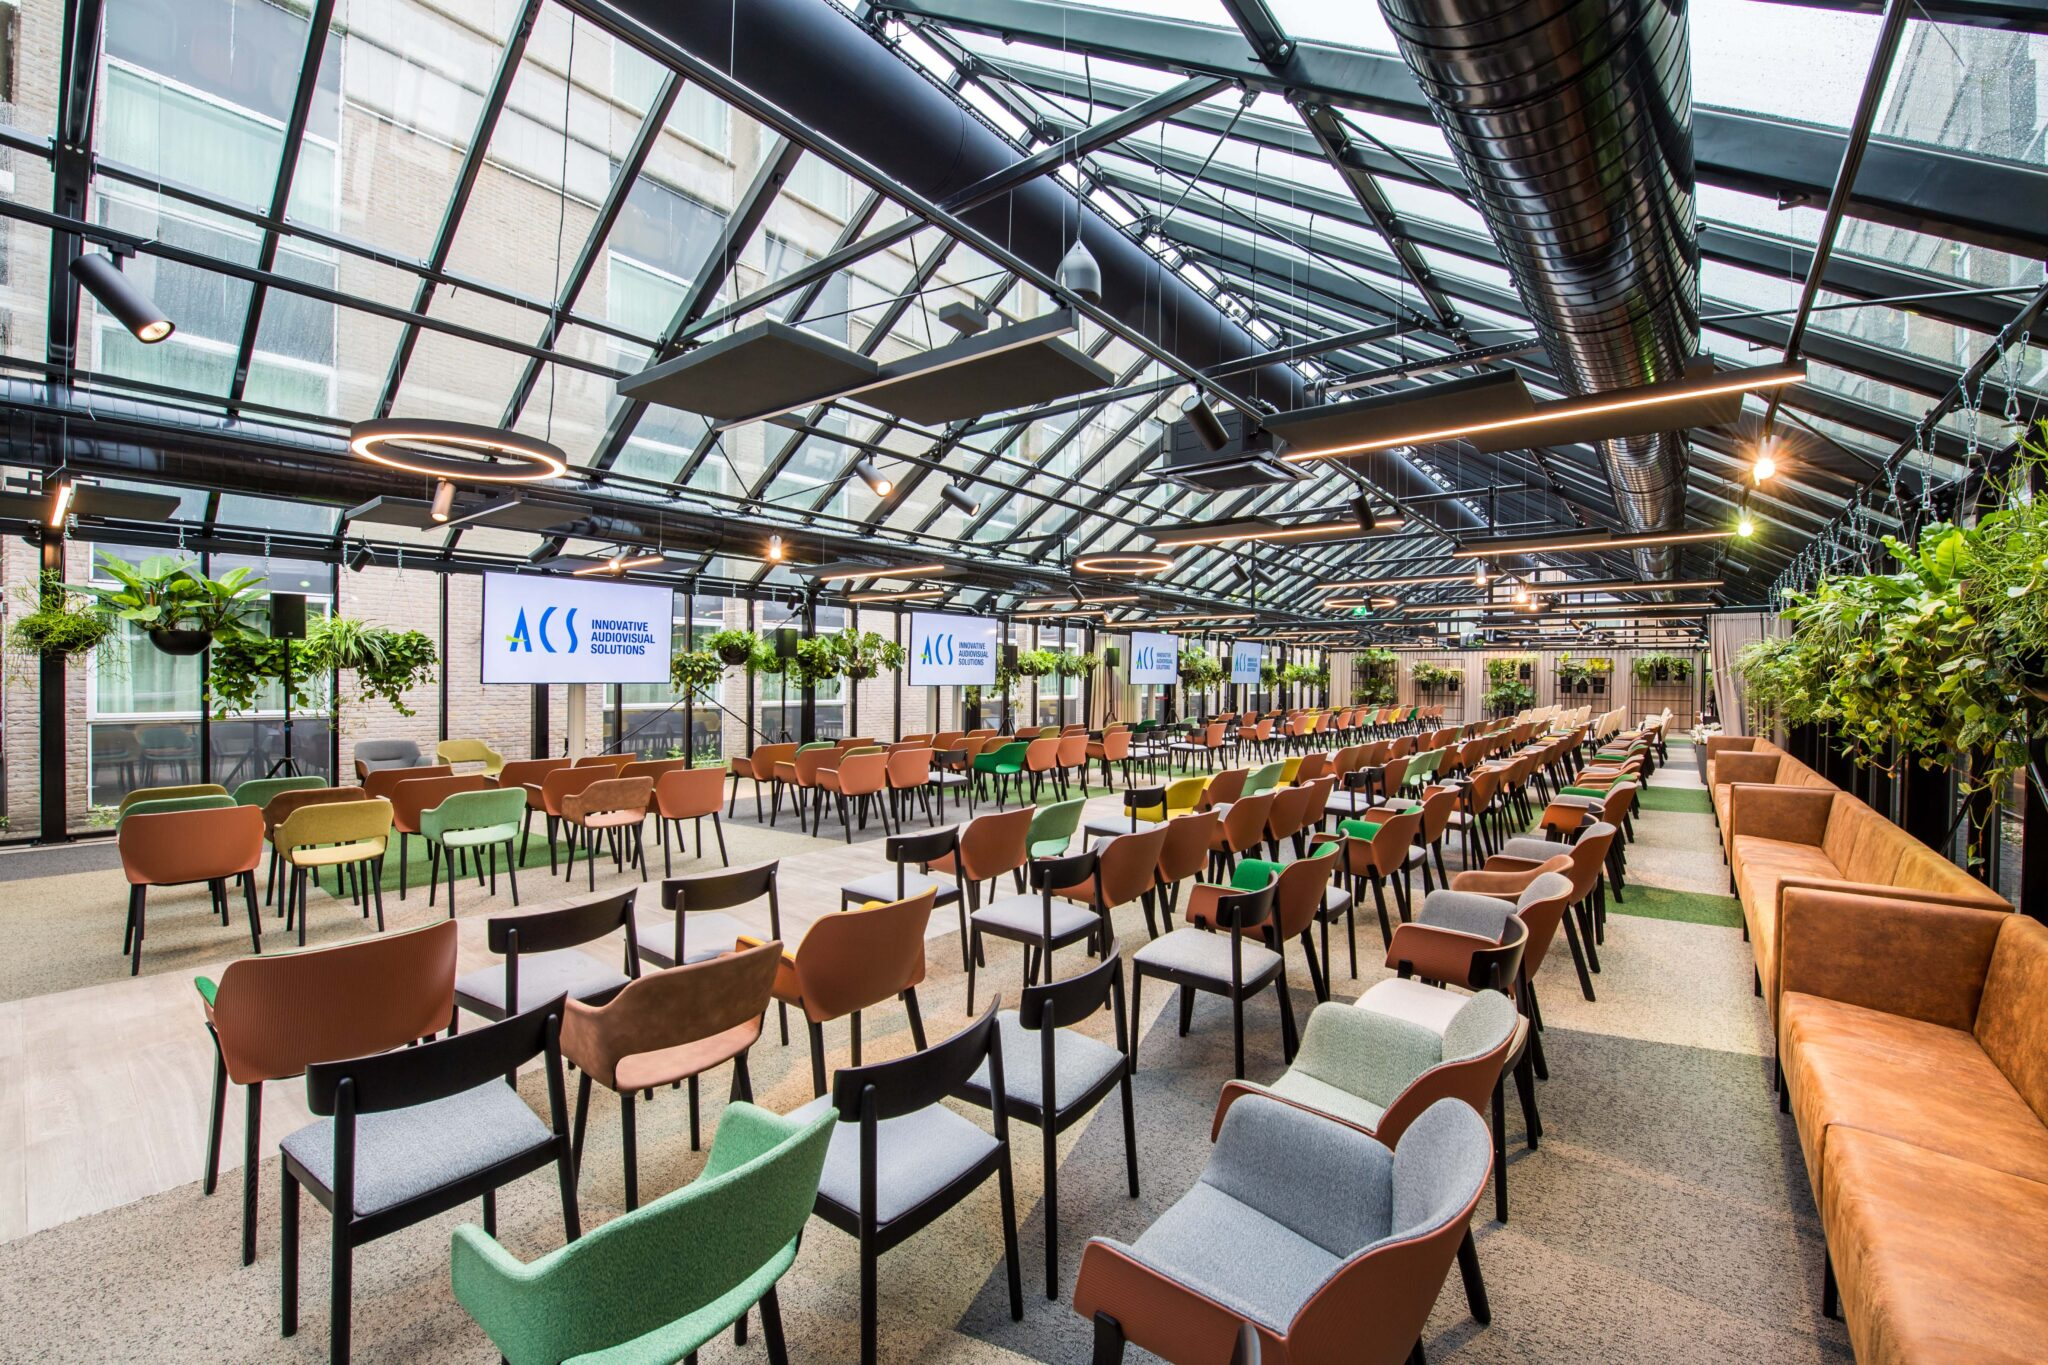 Greenhouse - 2019 - Amsterdam